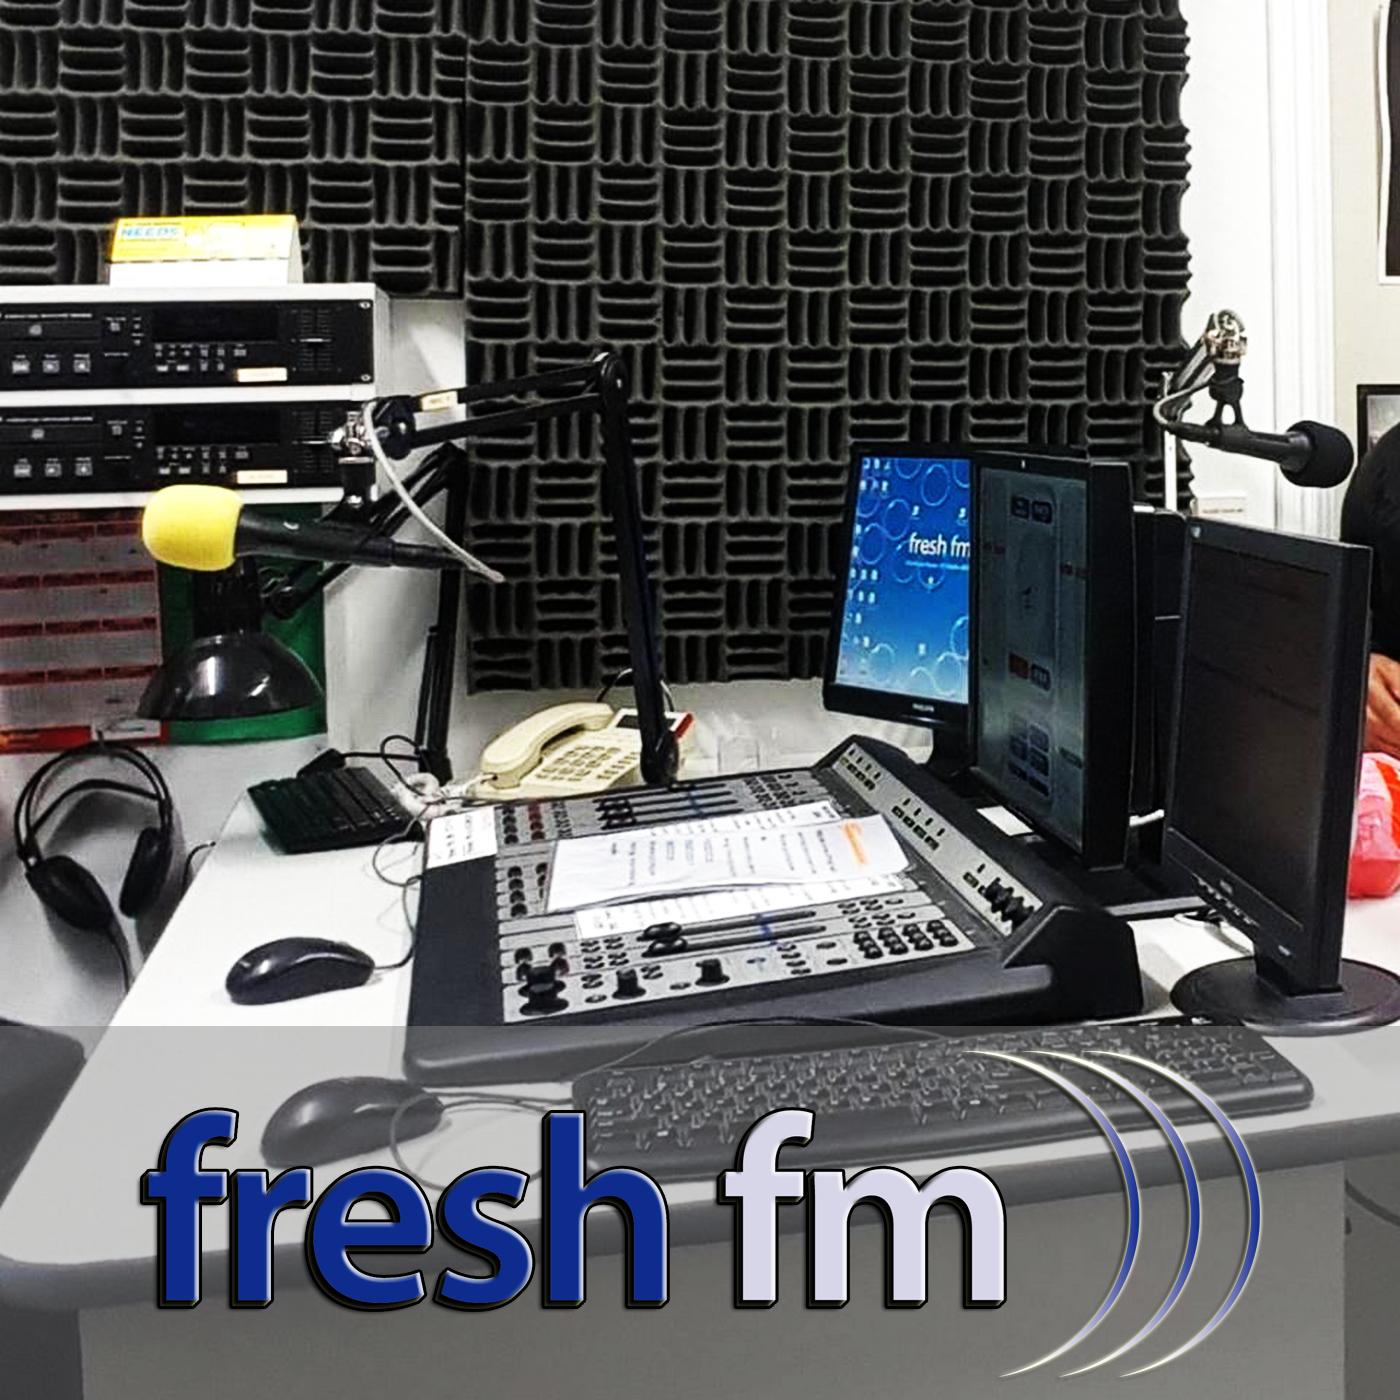 https://cdn.accessradio.org/StationFolder/freshfm/Images/Fetu-O-Samoa3.png